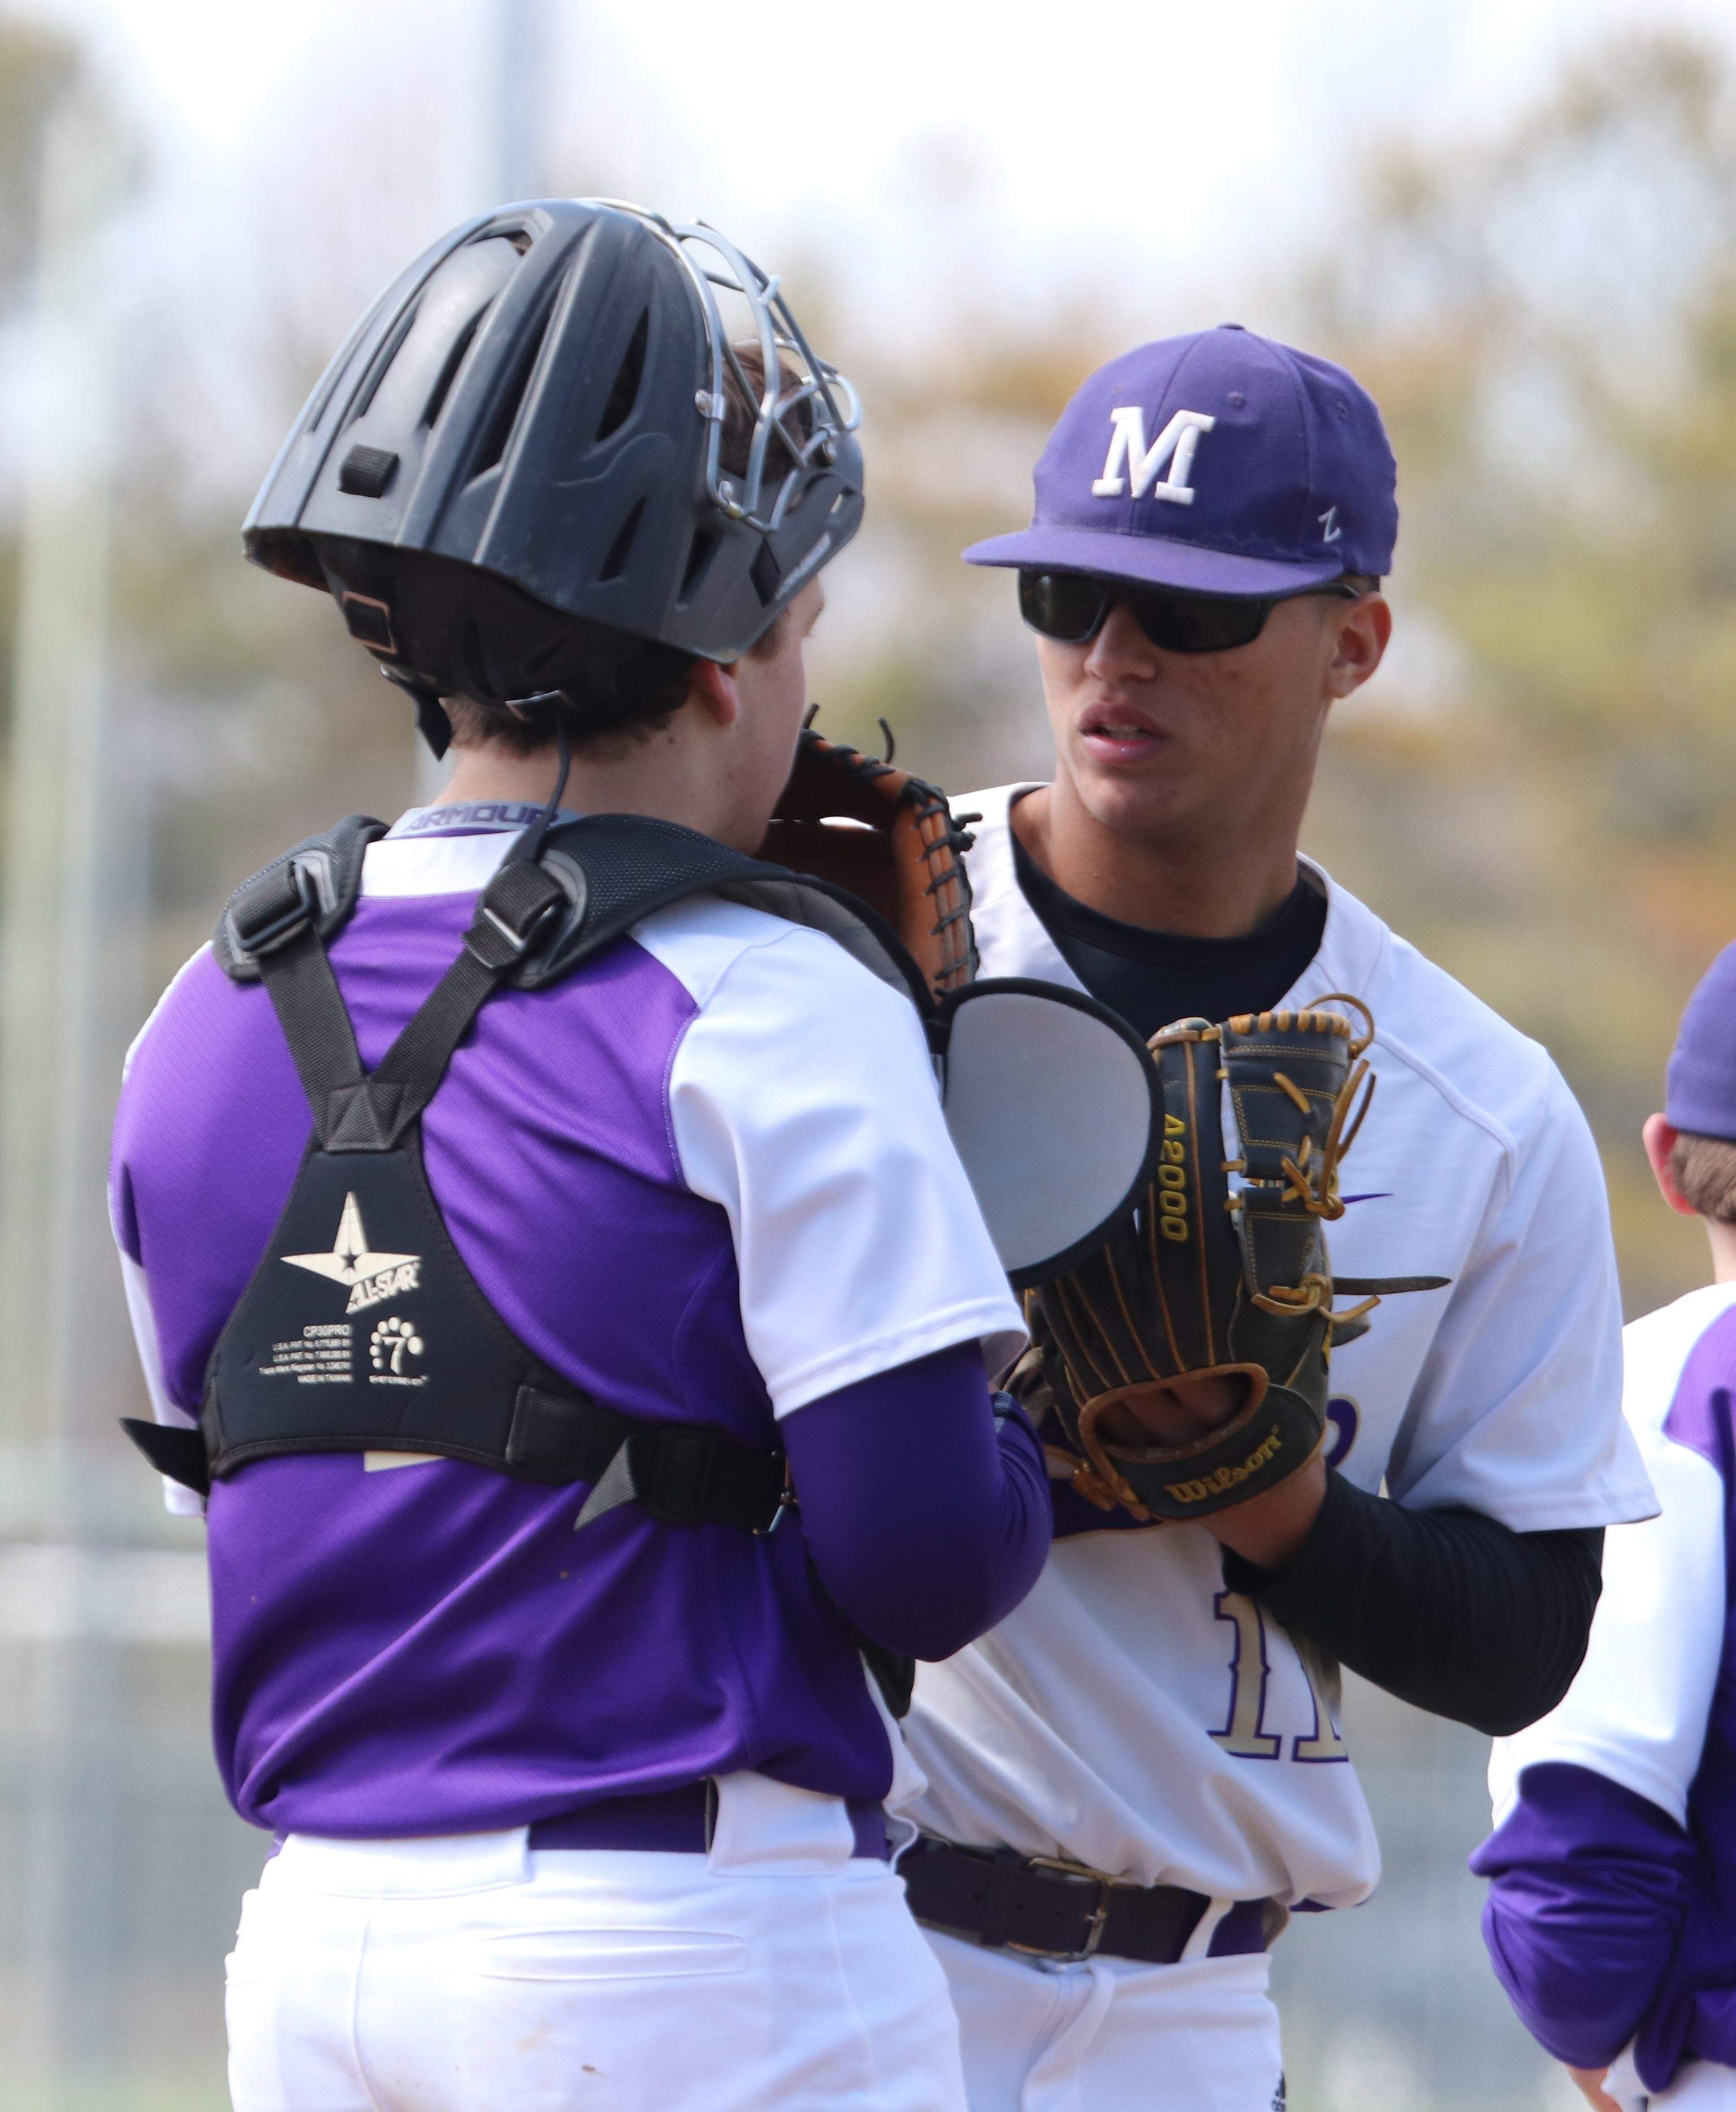 Jack Fitzgerald 2019 Baseball Catcher Monroe Township Nj Tri State Arsenal With Nick Payero Seton Hall Pitcher Jack Fitzgerald Baseball Catcher Fitzgerald